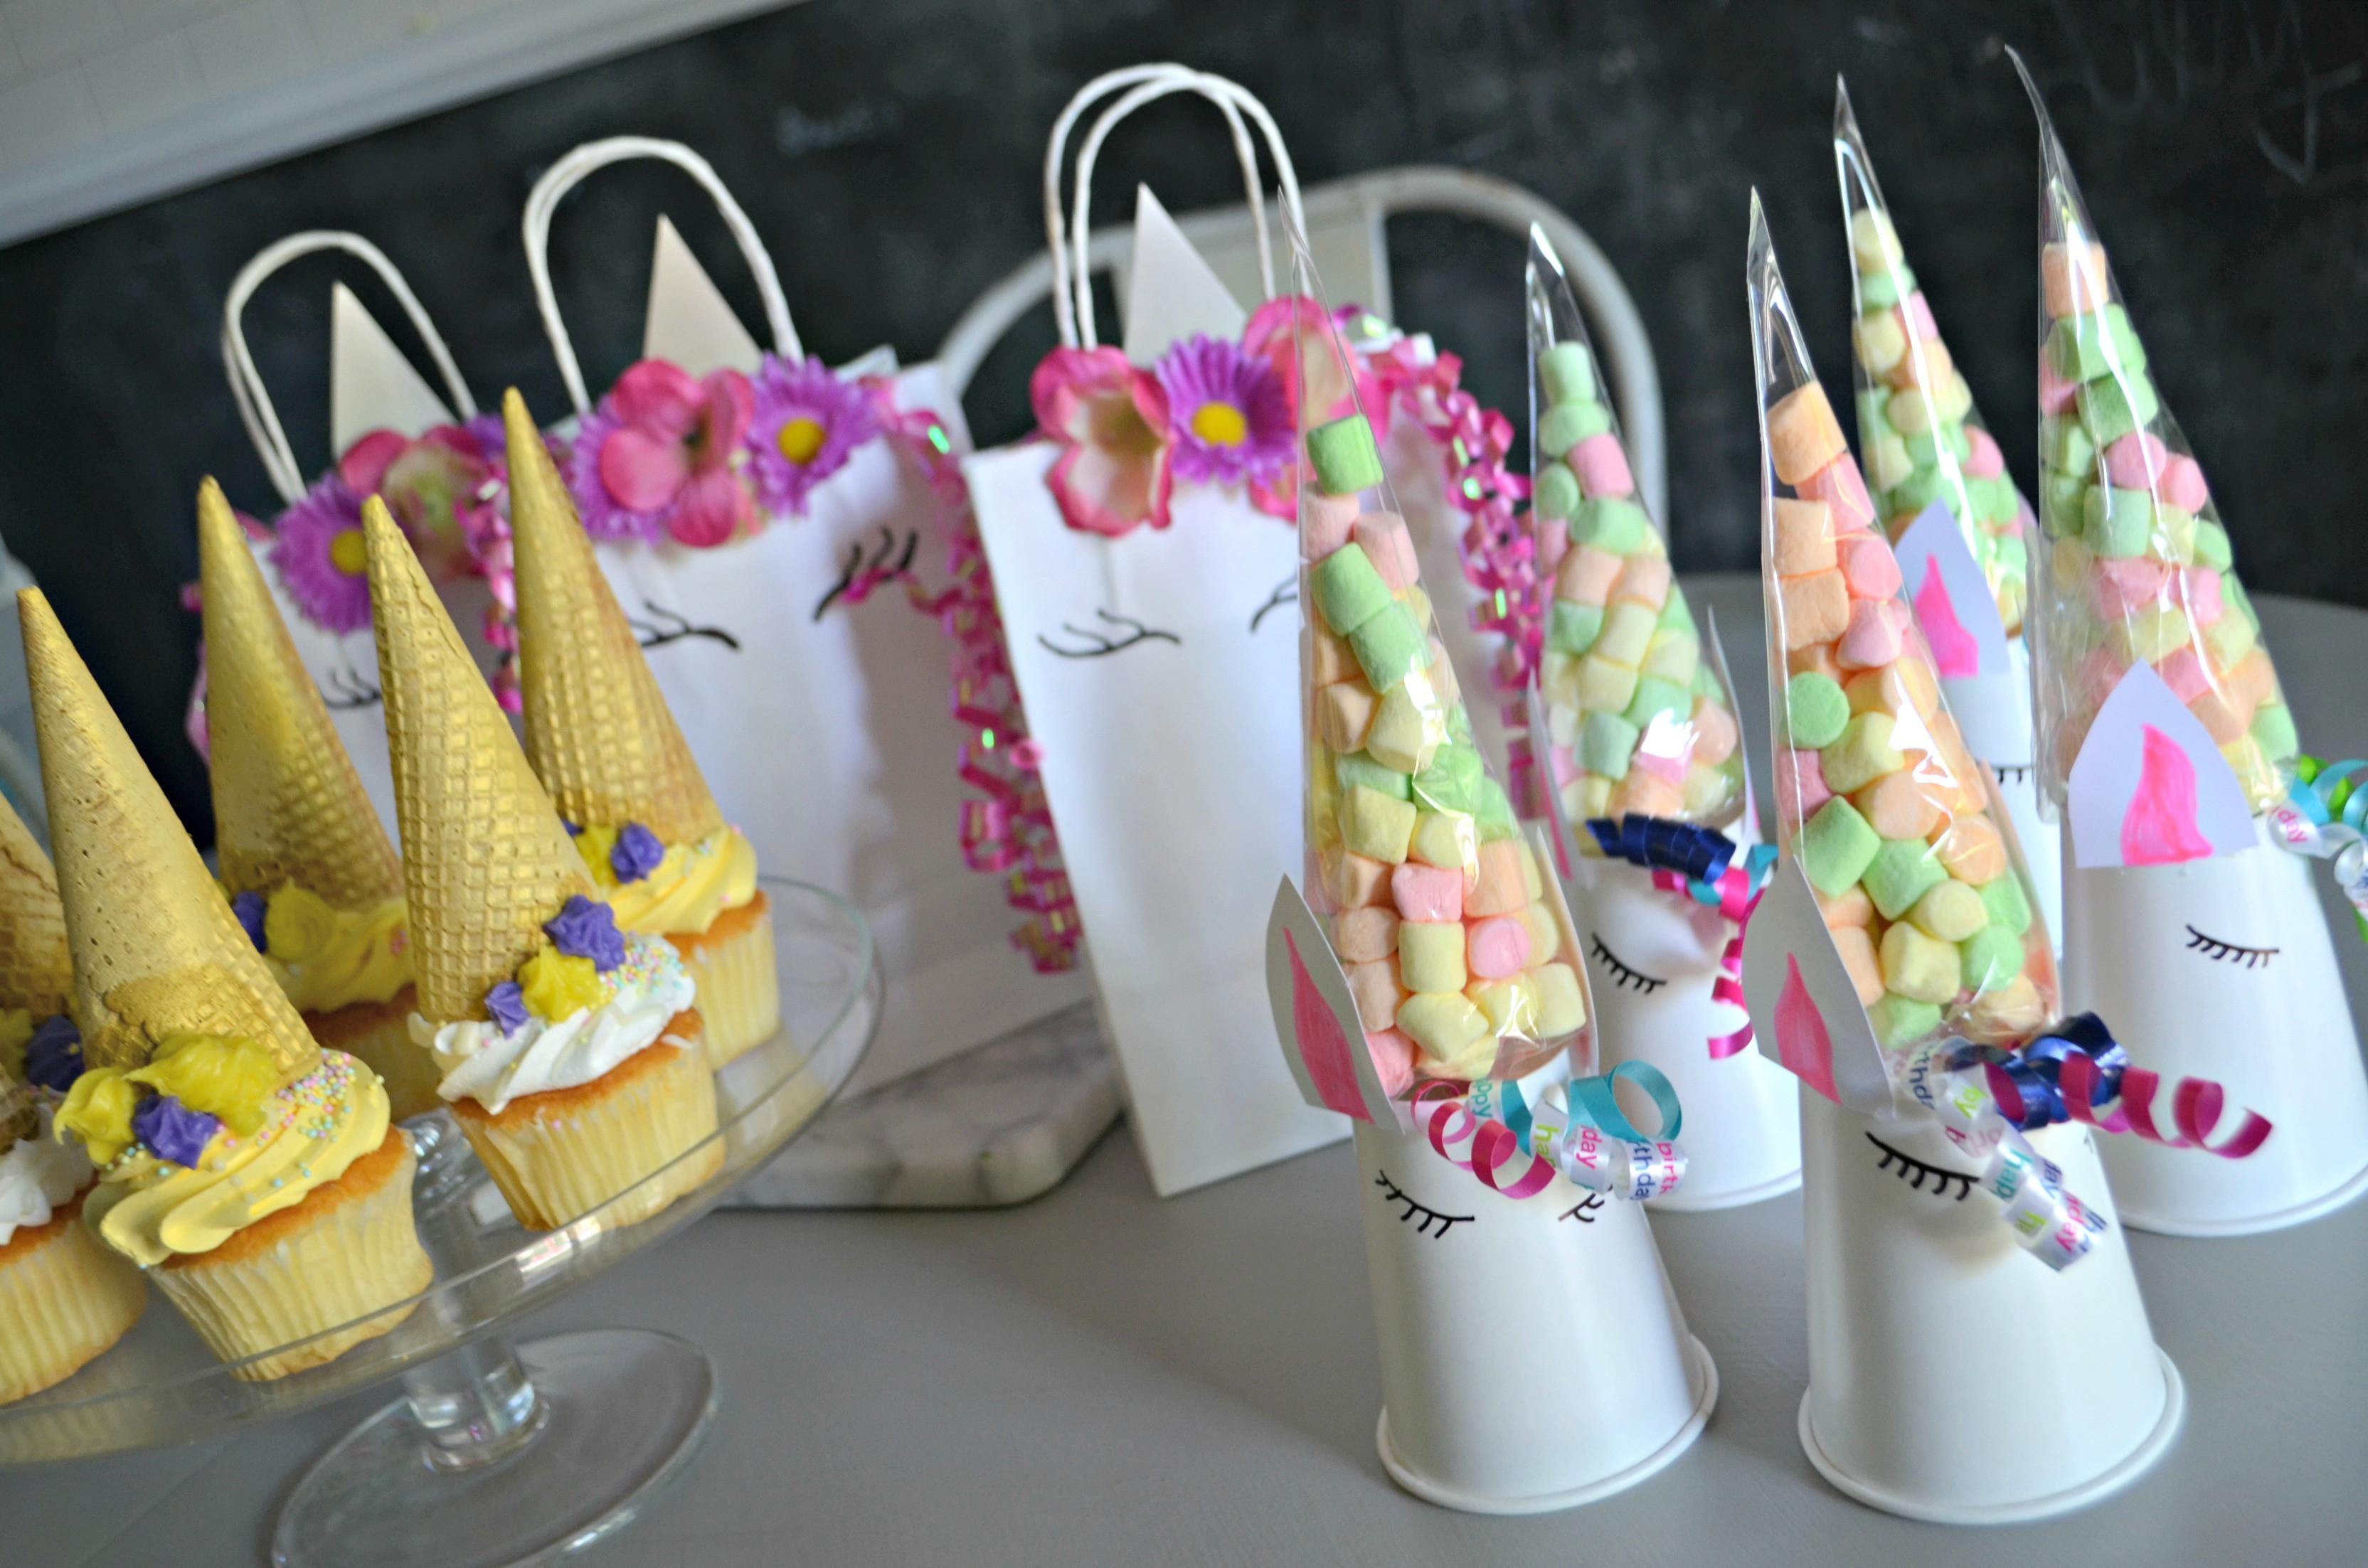 Unicorn Birthday Party Decorations Ideas  Make These 3 Frugal Cute and Easy DIY Unicorn Birthday